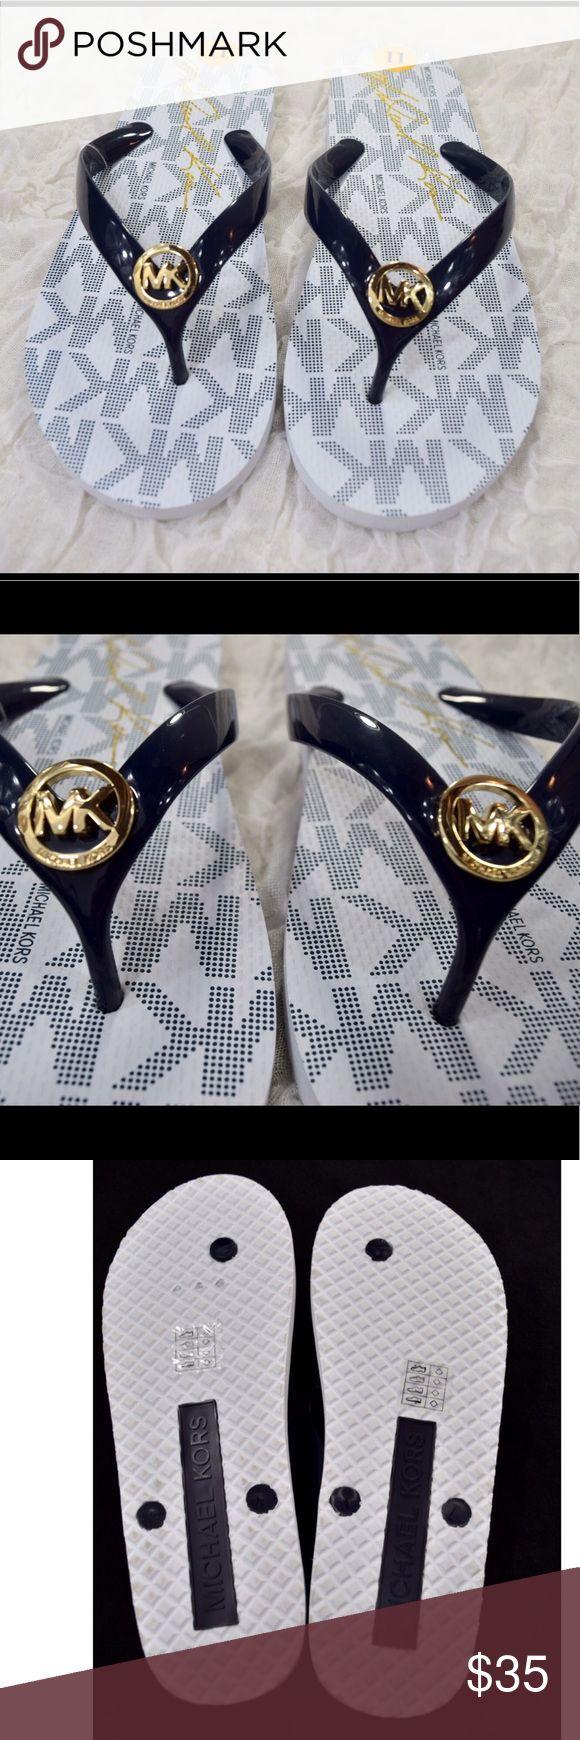 NEW Navy Blue Michael Kors Flip Flops Michael Kors flip flops🔹Size 11🔹Navy Blue and white🔹Gold MK pendant🔹Brand new🔹Smoke and pet free home Michael Kors Shoes Sandals